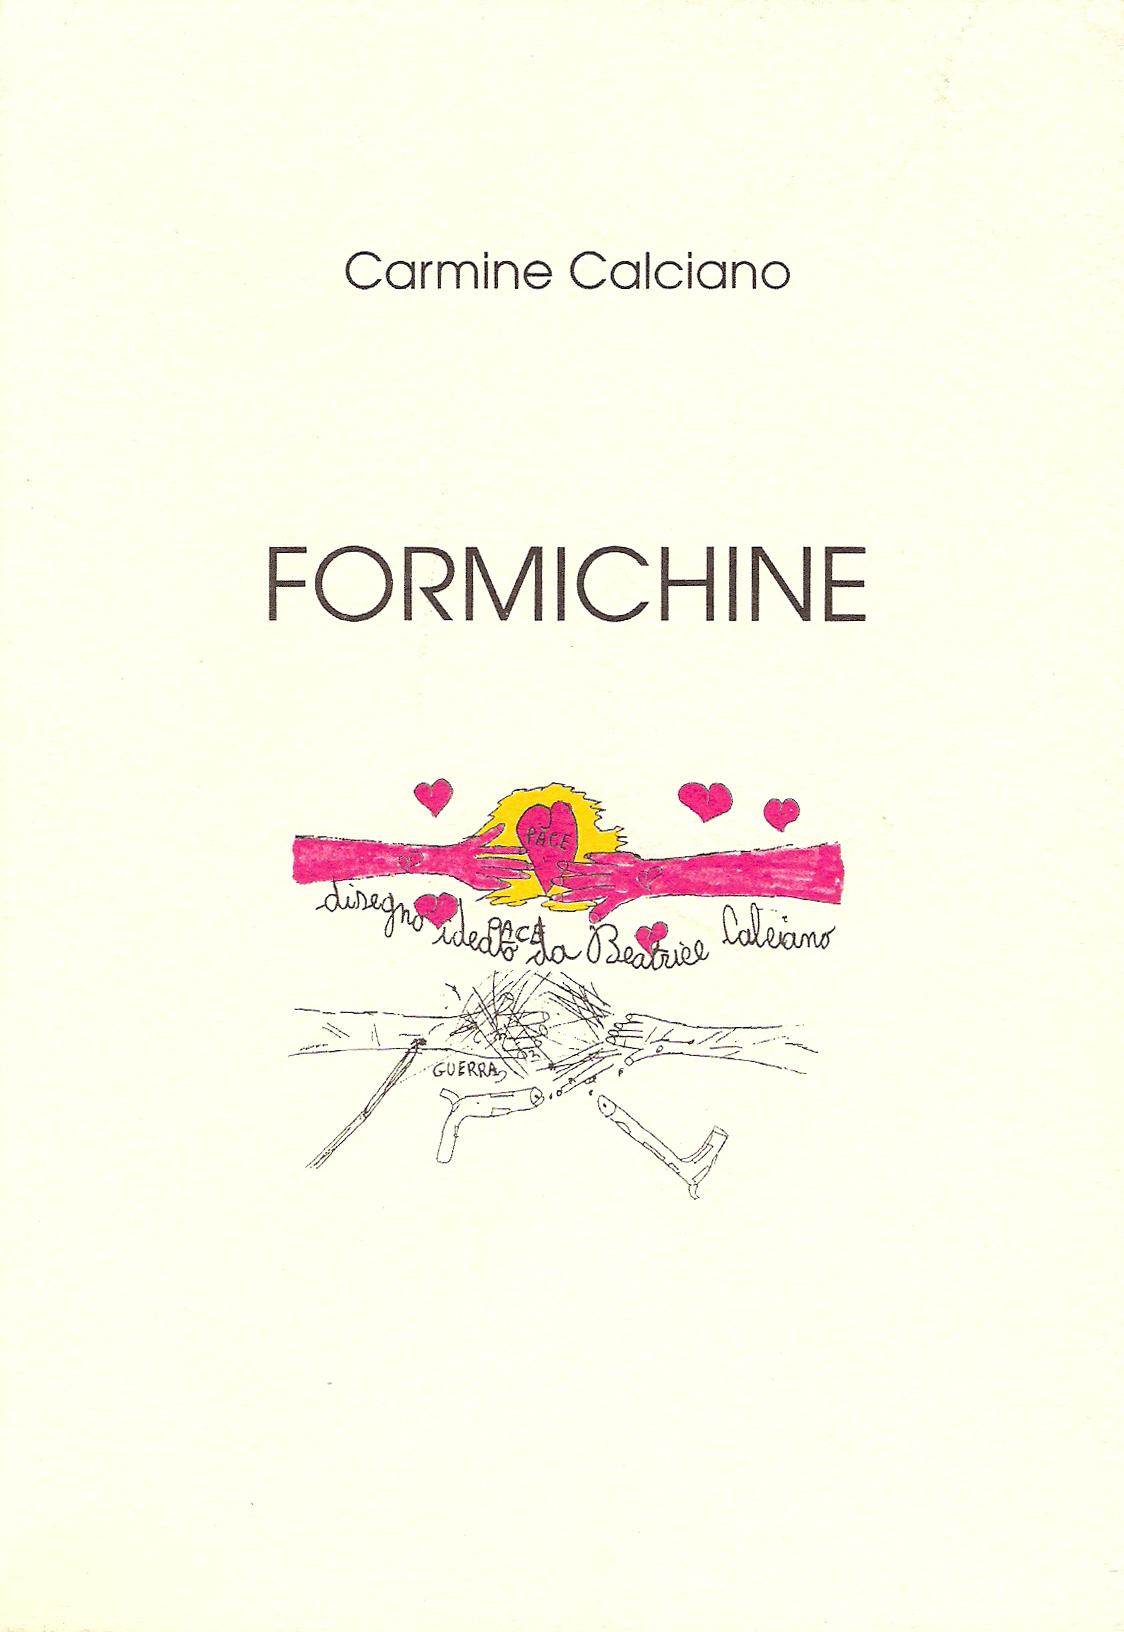 Formichine